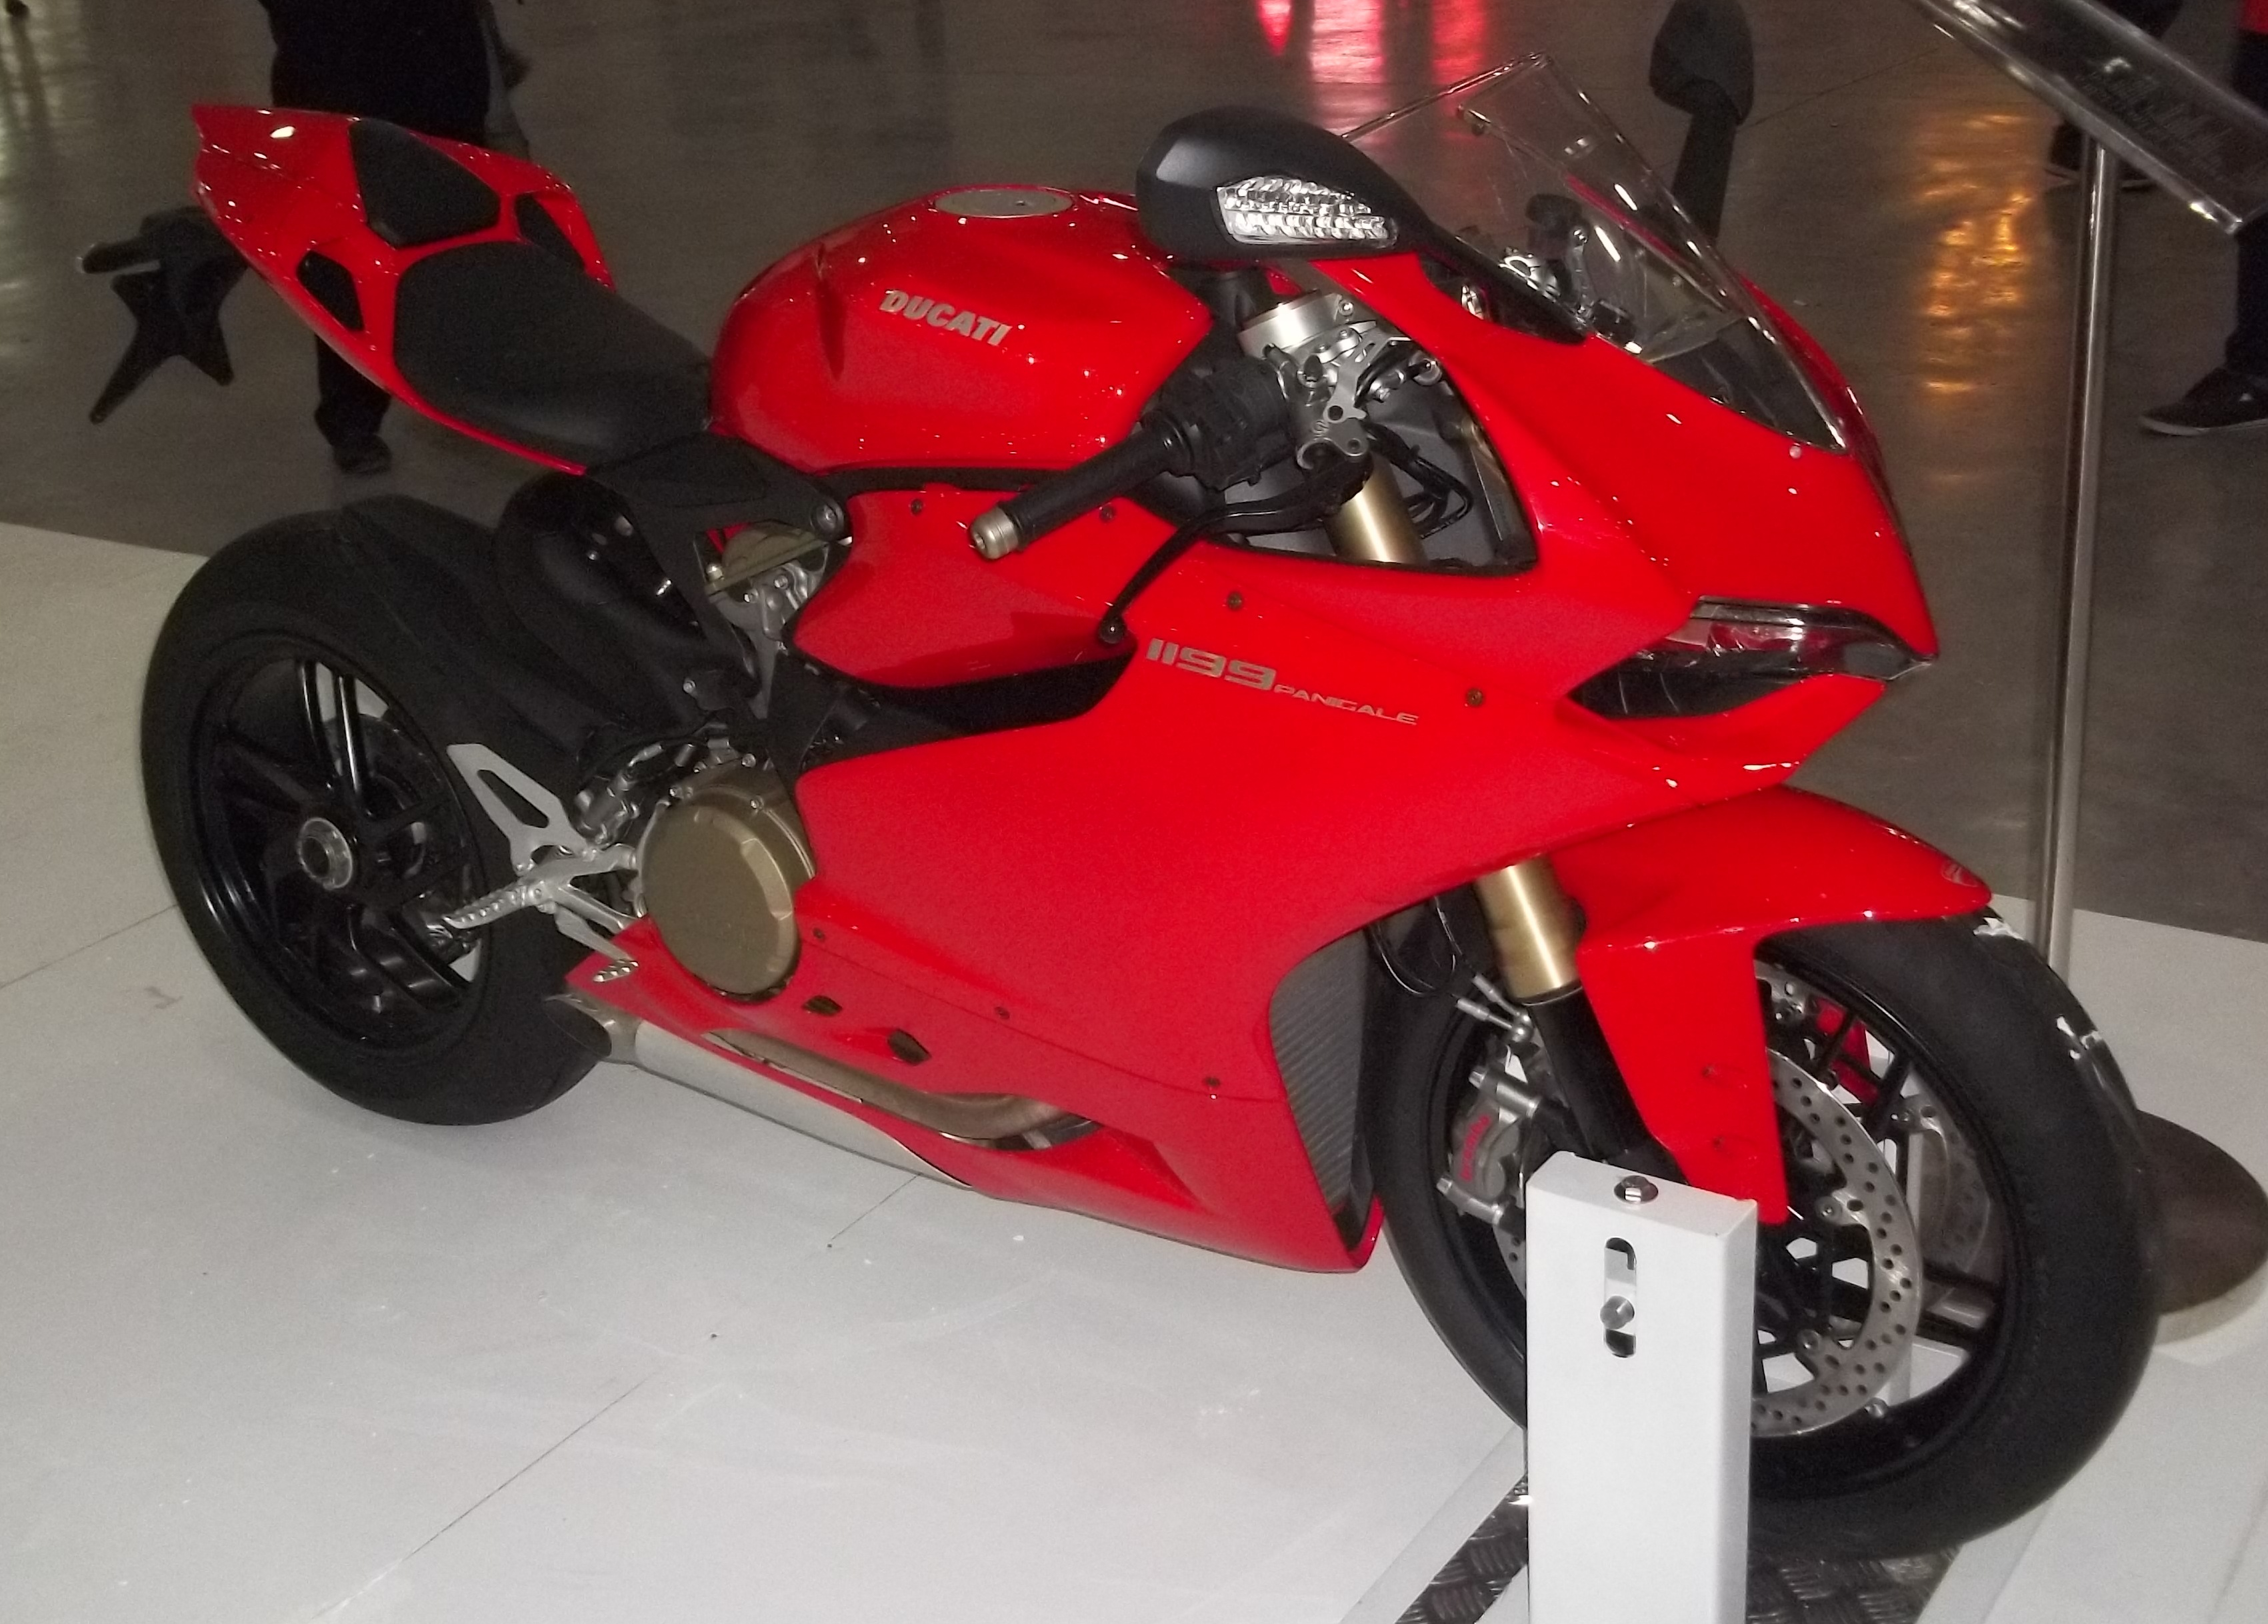 ini lho daftar harga motor ducati | hadiyanta (blogger